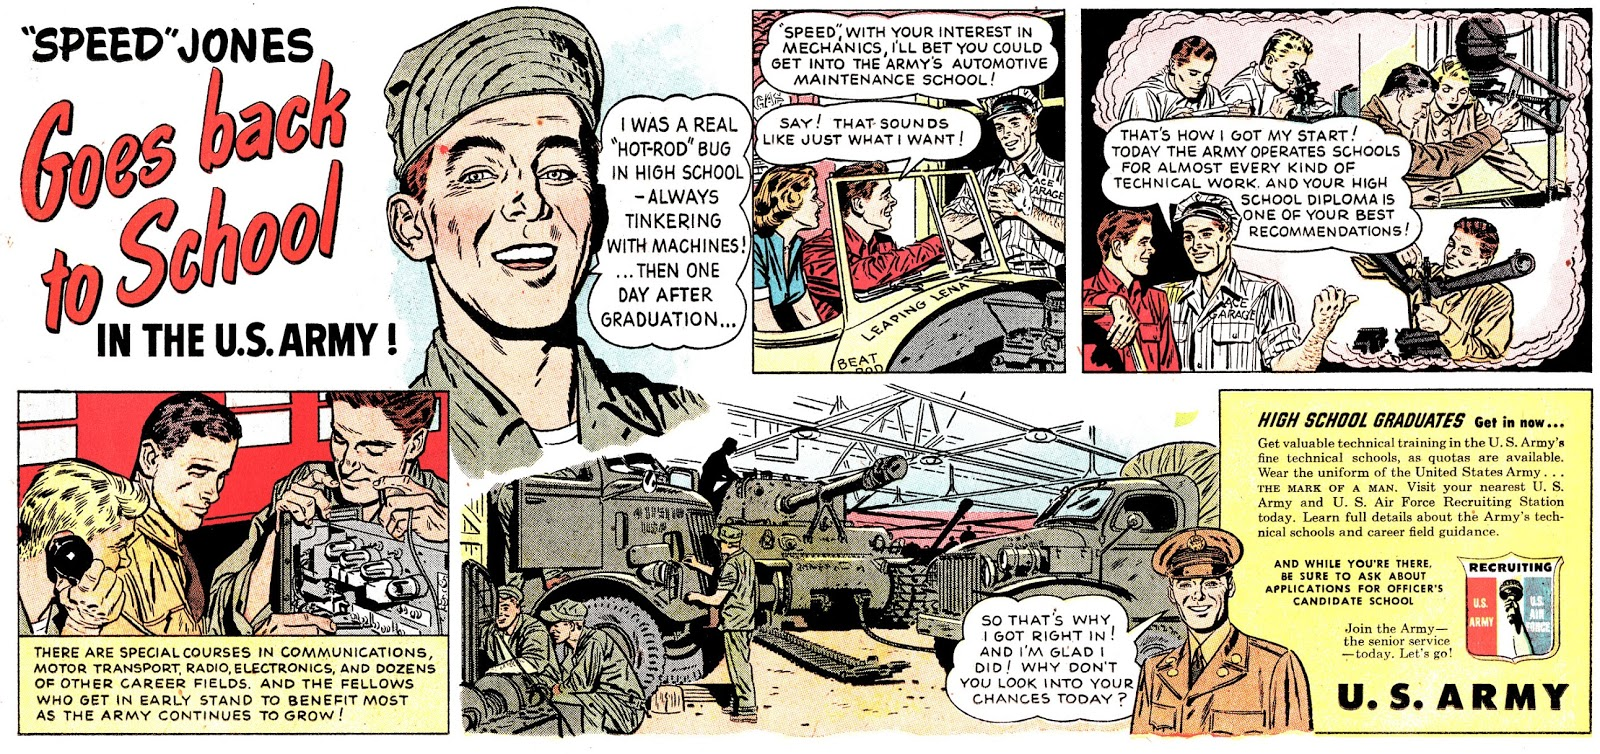 An Army ad by Elmer Wexler